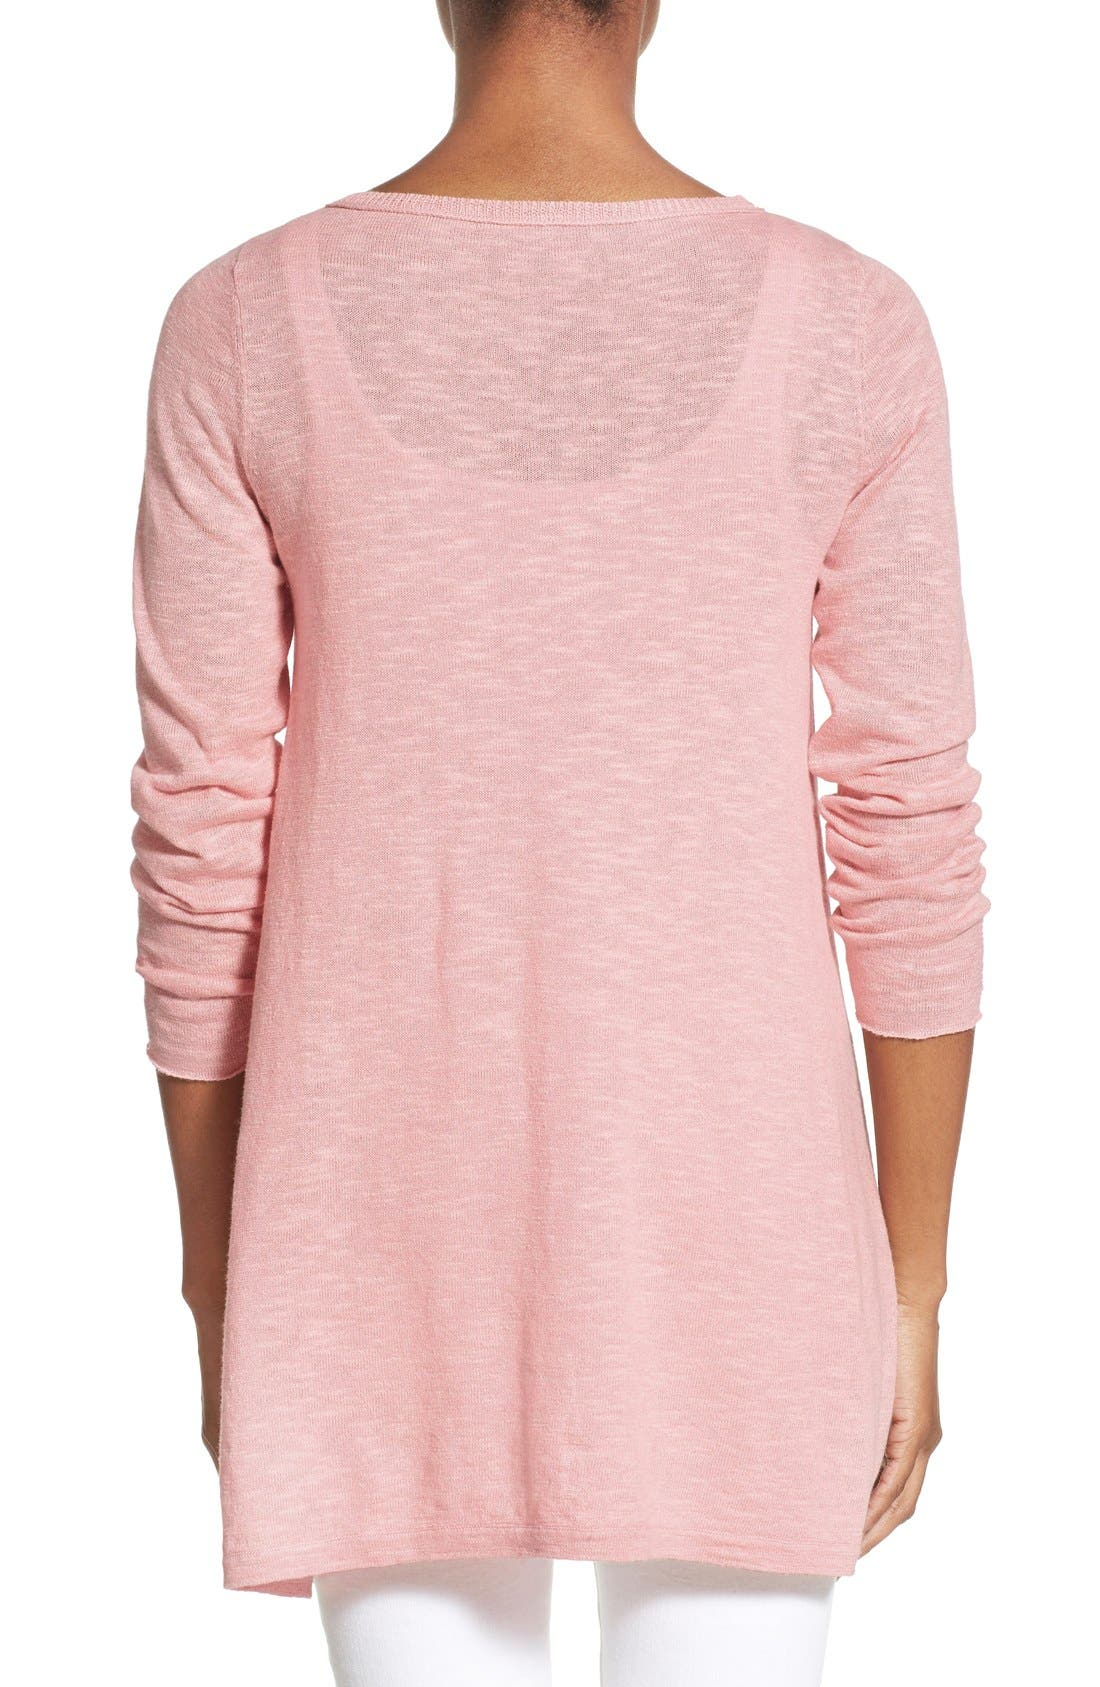 Alternate Image 2  - Eileen Fisher Organic Linen & Cotton Bateau Neck Sweater (Regular & Petite)